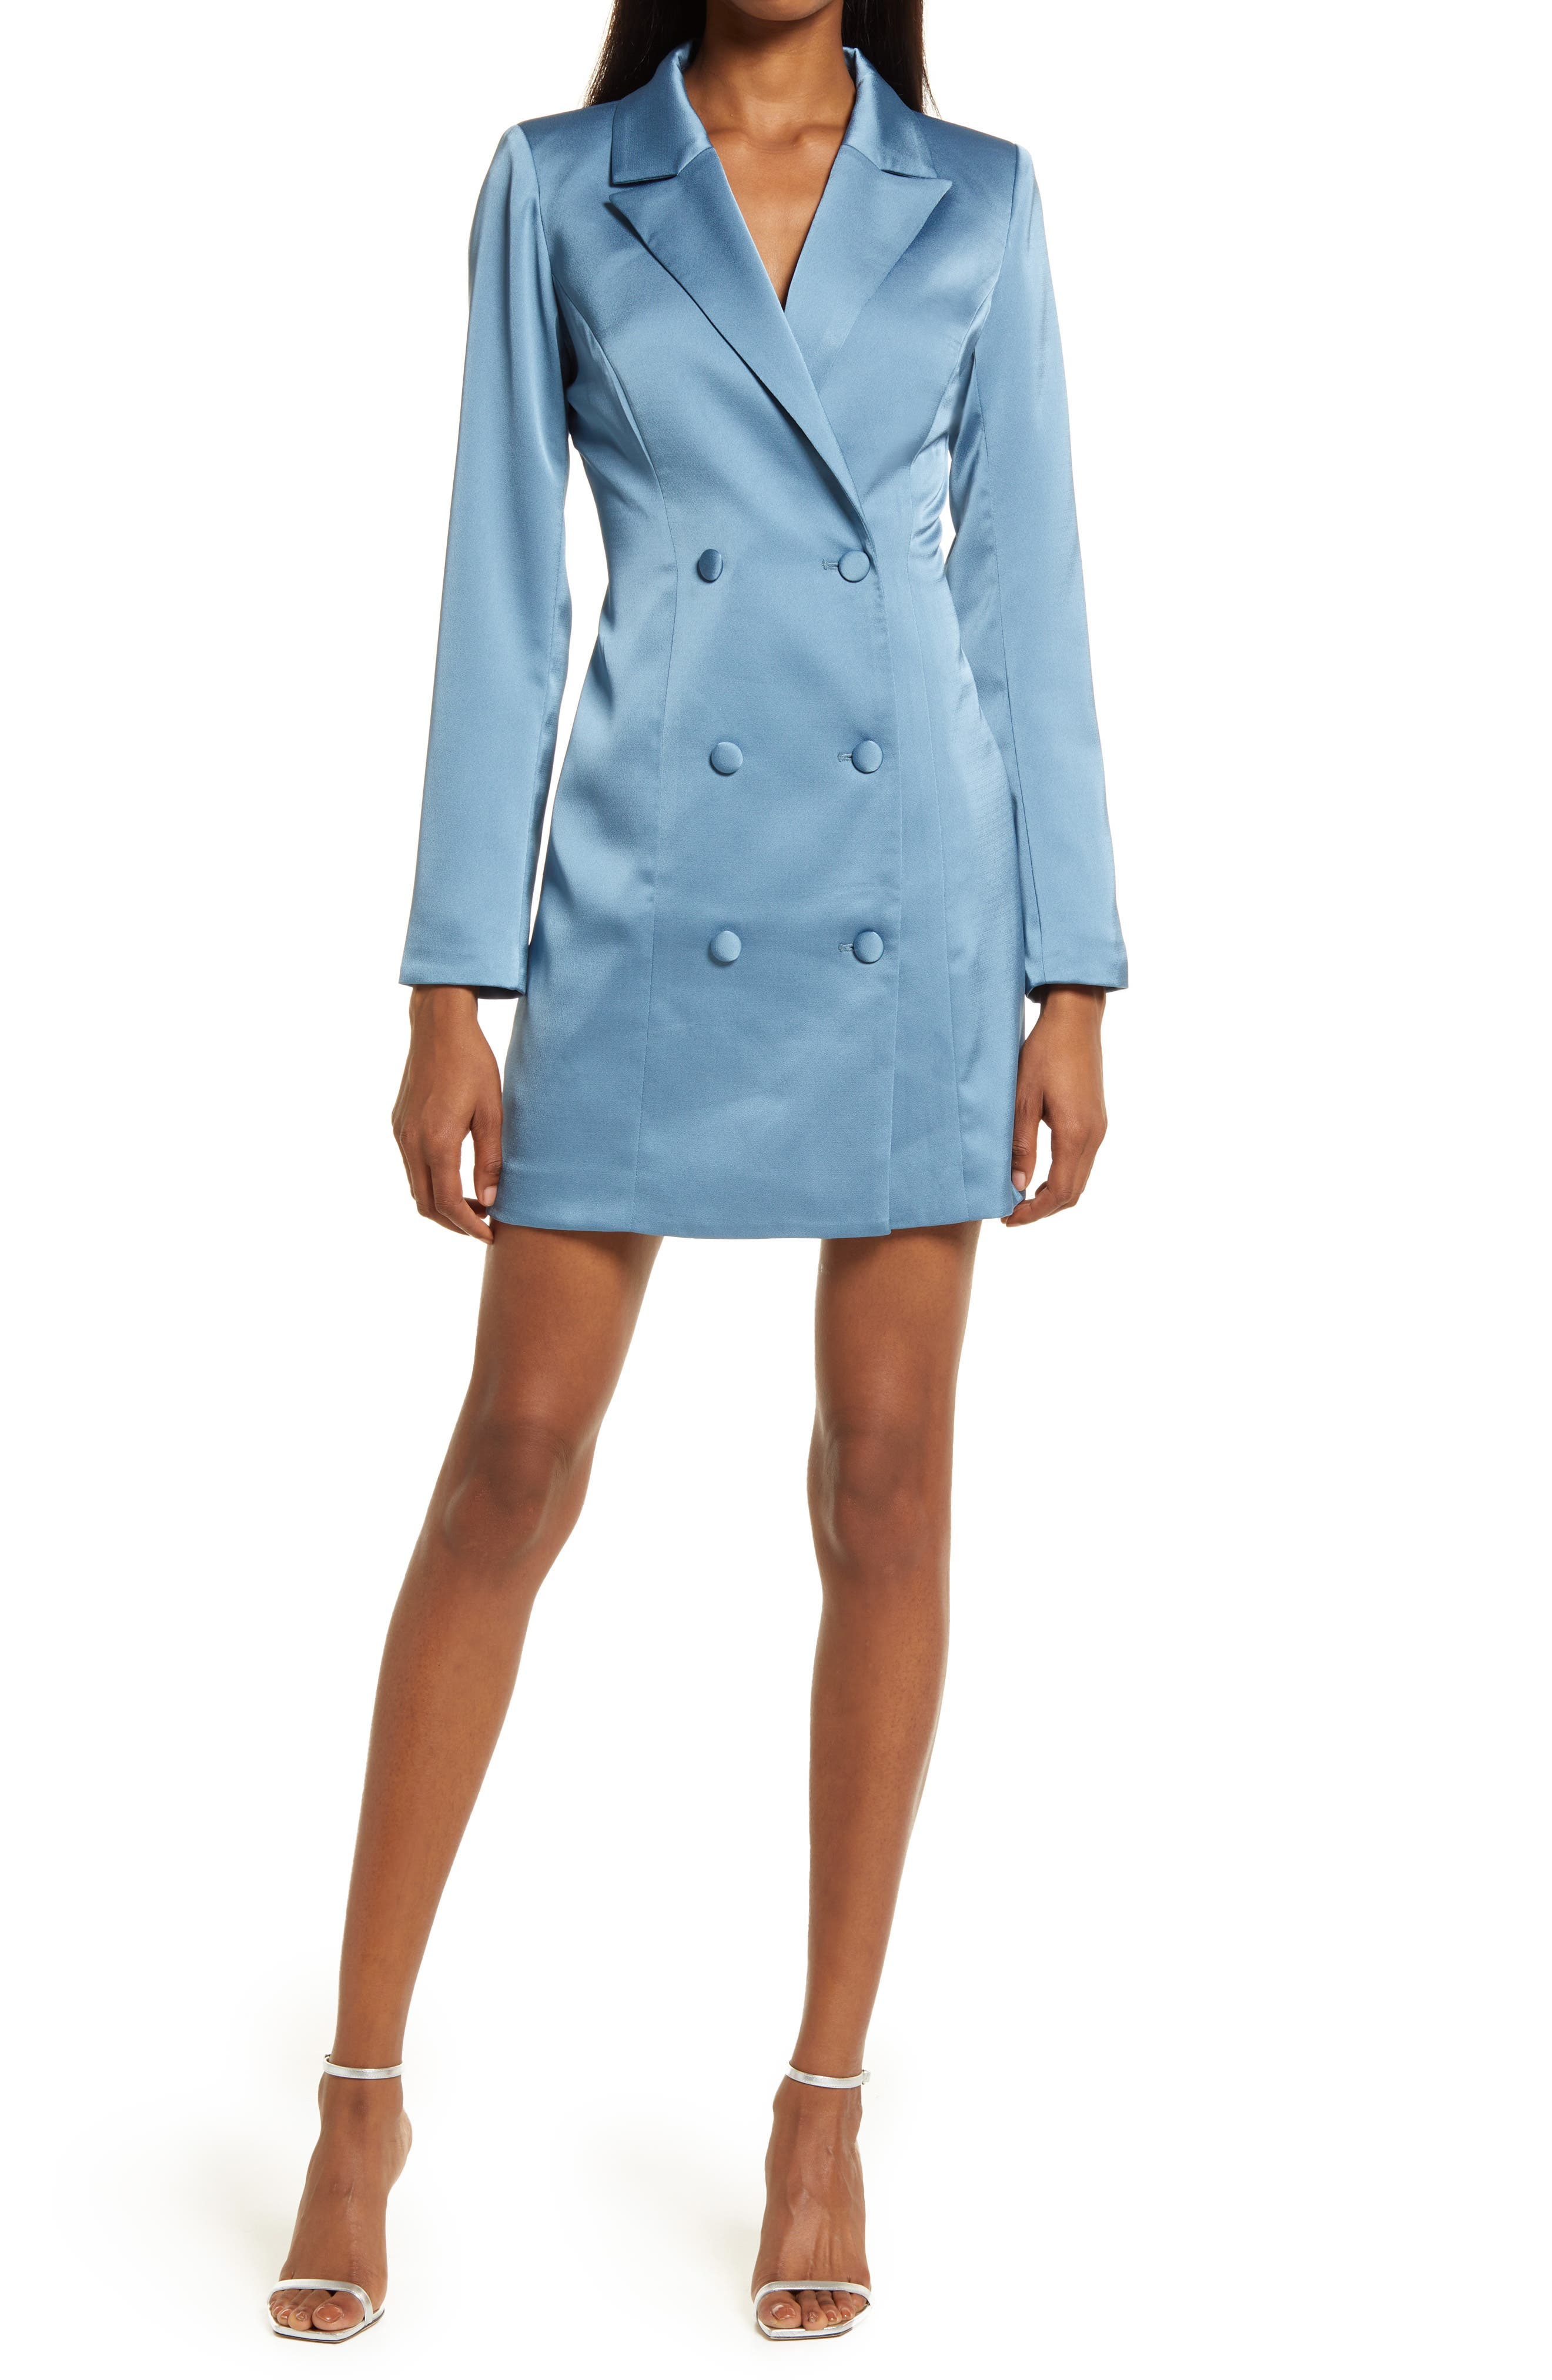 Stella Long Sleeve Blazer Dress